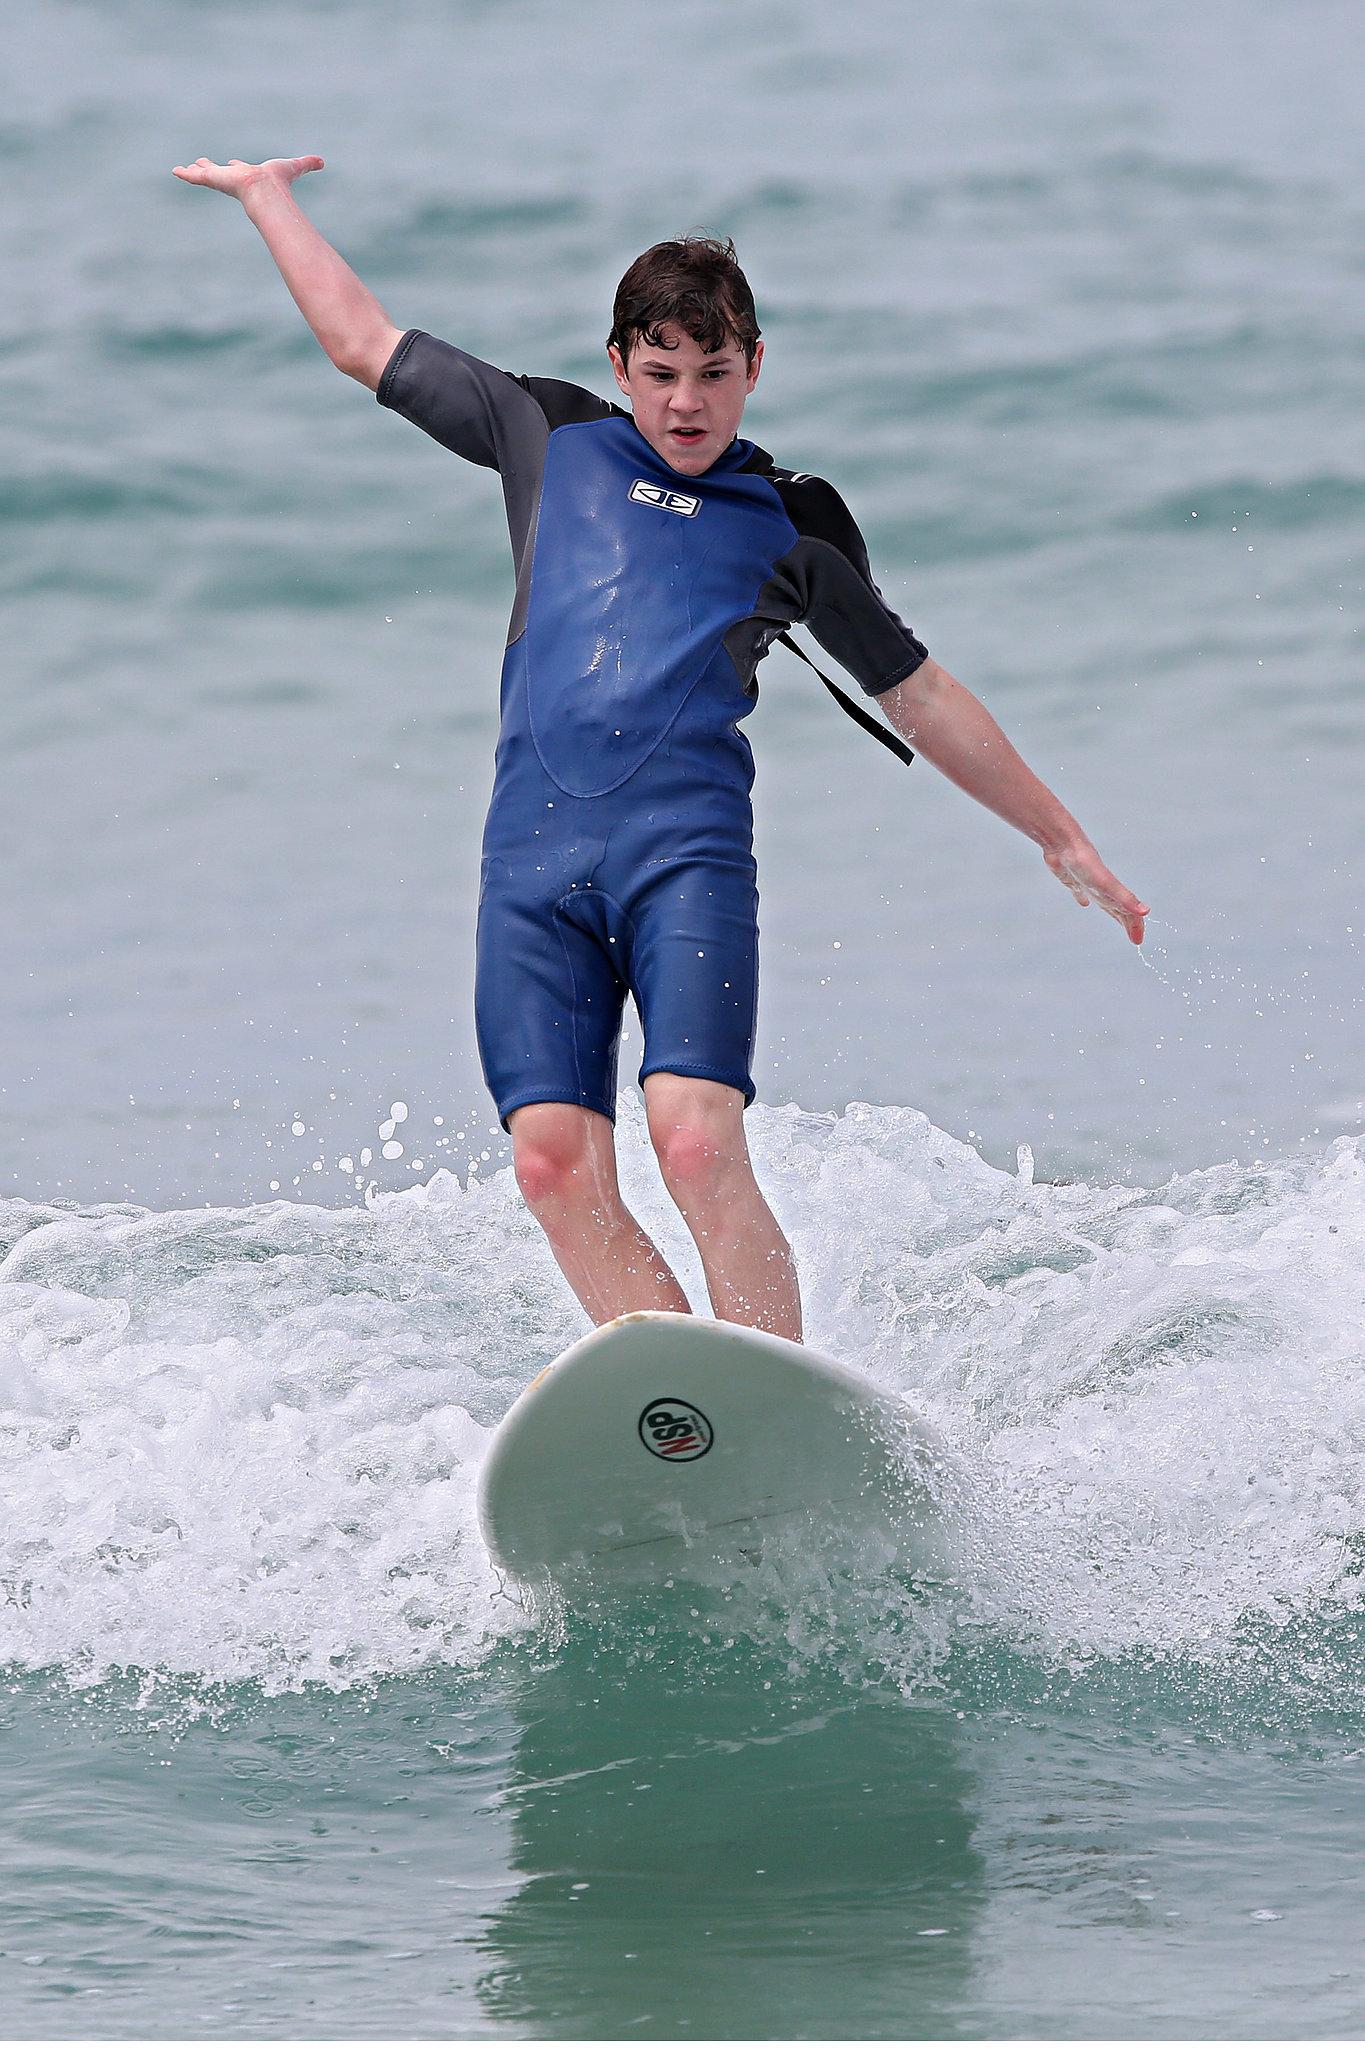 Nolan Gould went surfing at Bondi Beach on Feb  18 Nolan Gould Wrestling